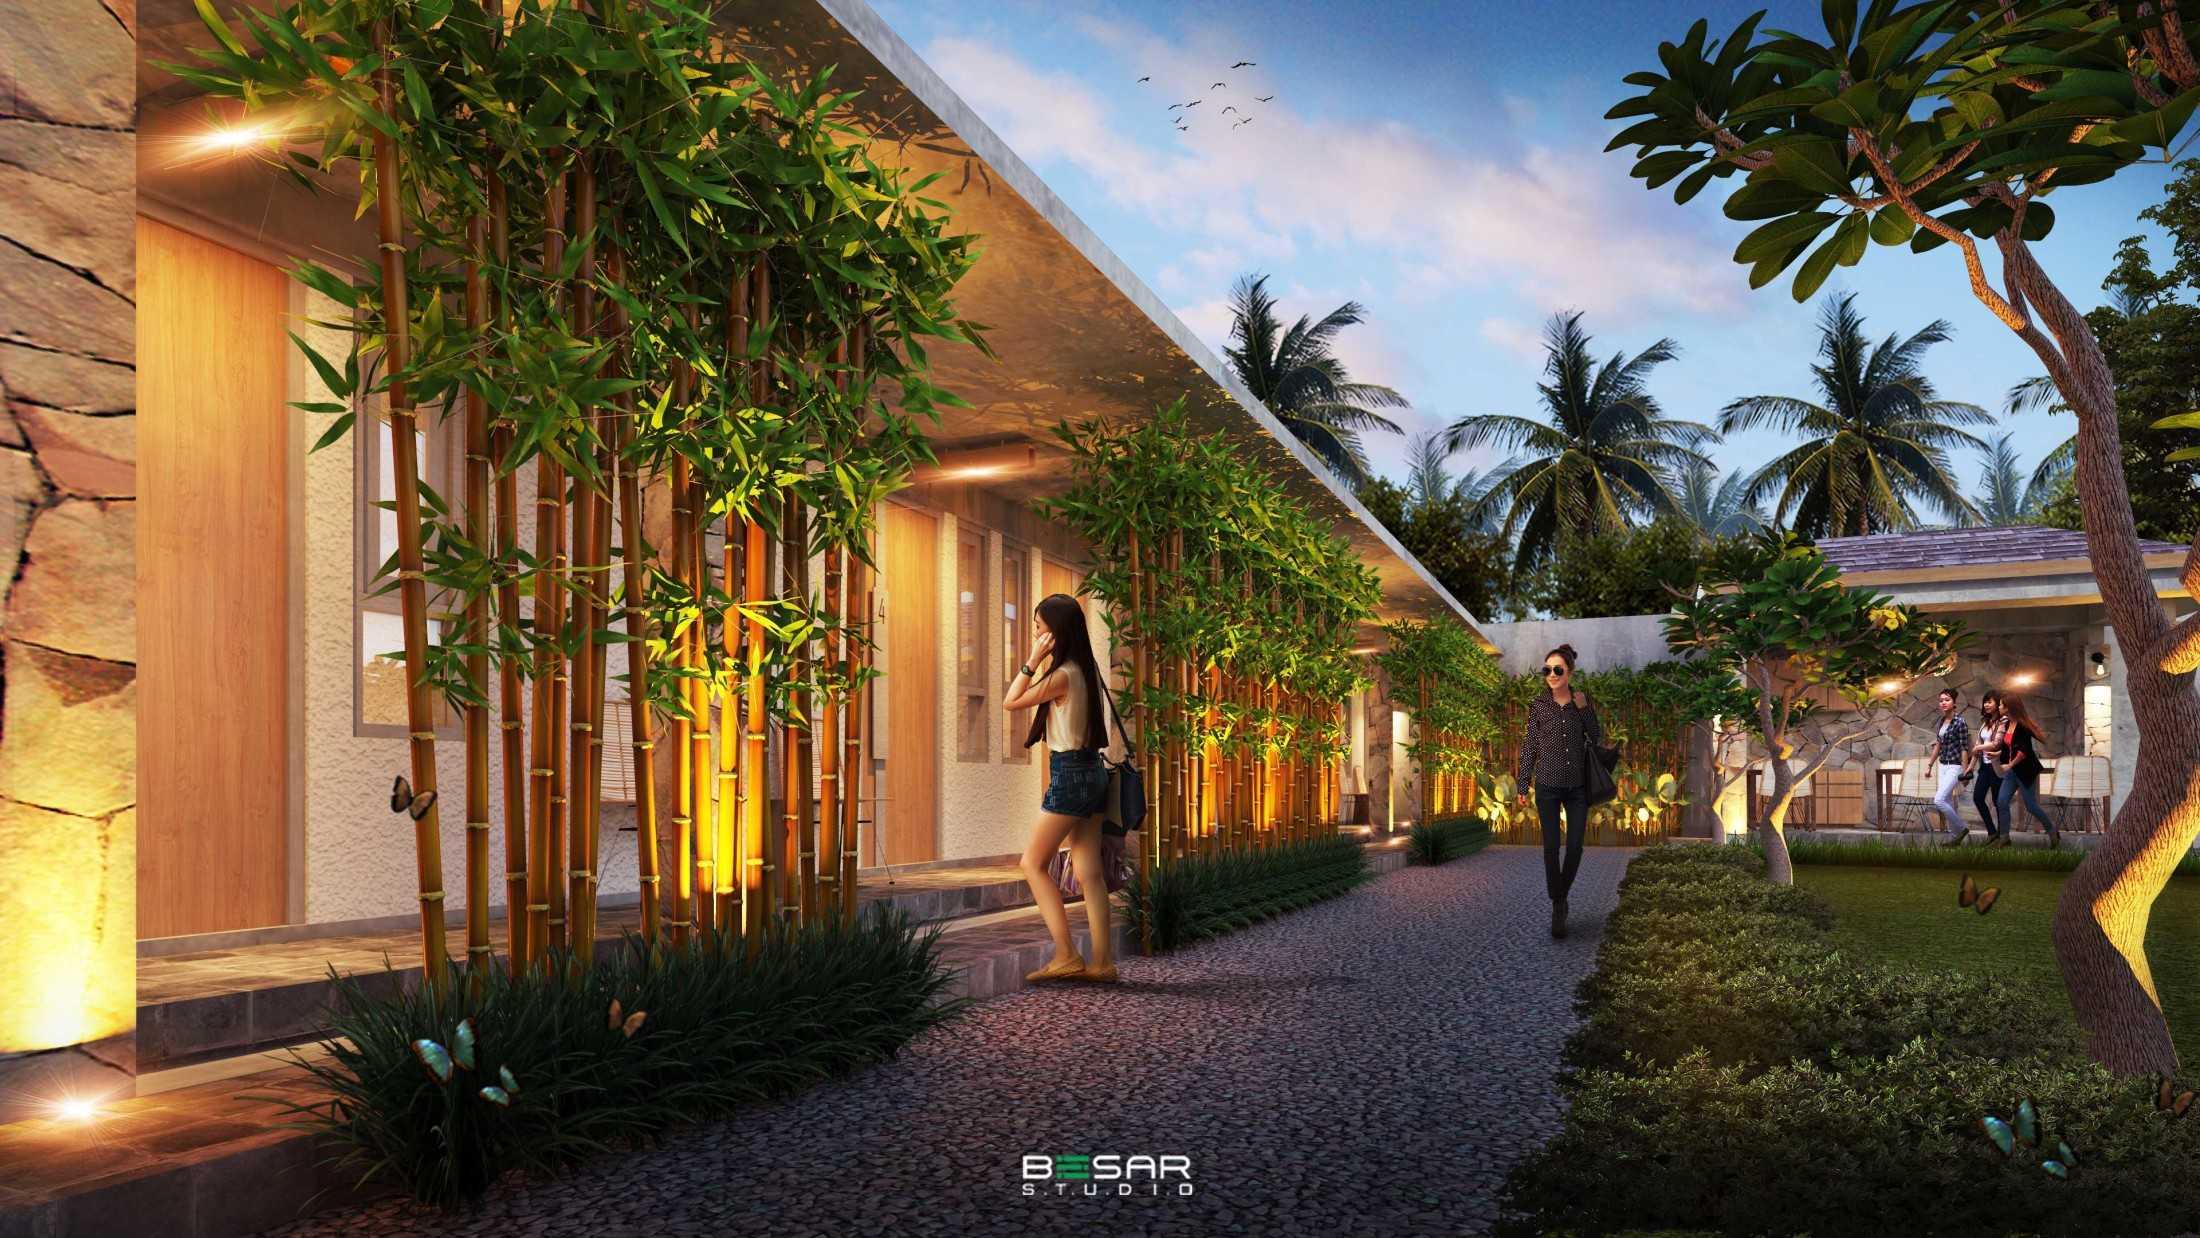 Studio Besar Guest House, Cirebon Cirebon, Kota Cirebon, Jawa Barat, Indonesia Cirebon, Kota Cirebon, Jawa Barat, Indonesia Studio-Besar-Guest-House-Cirebon  65630